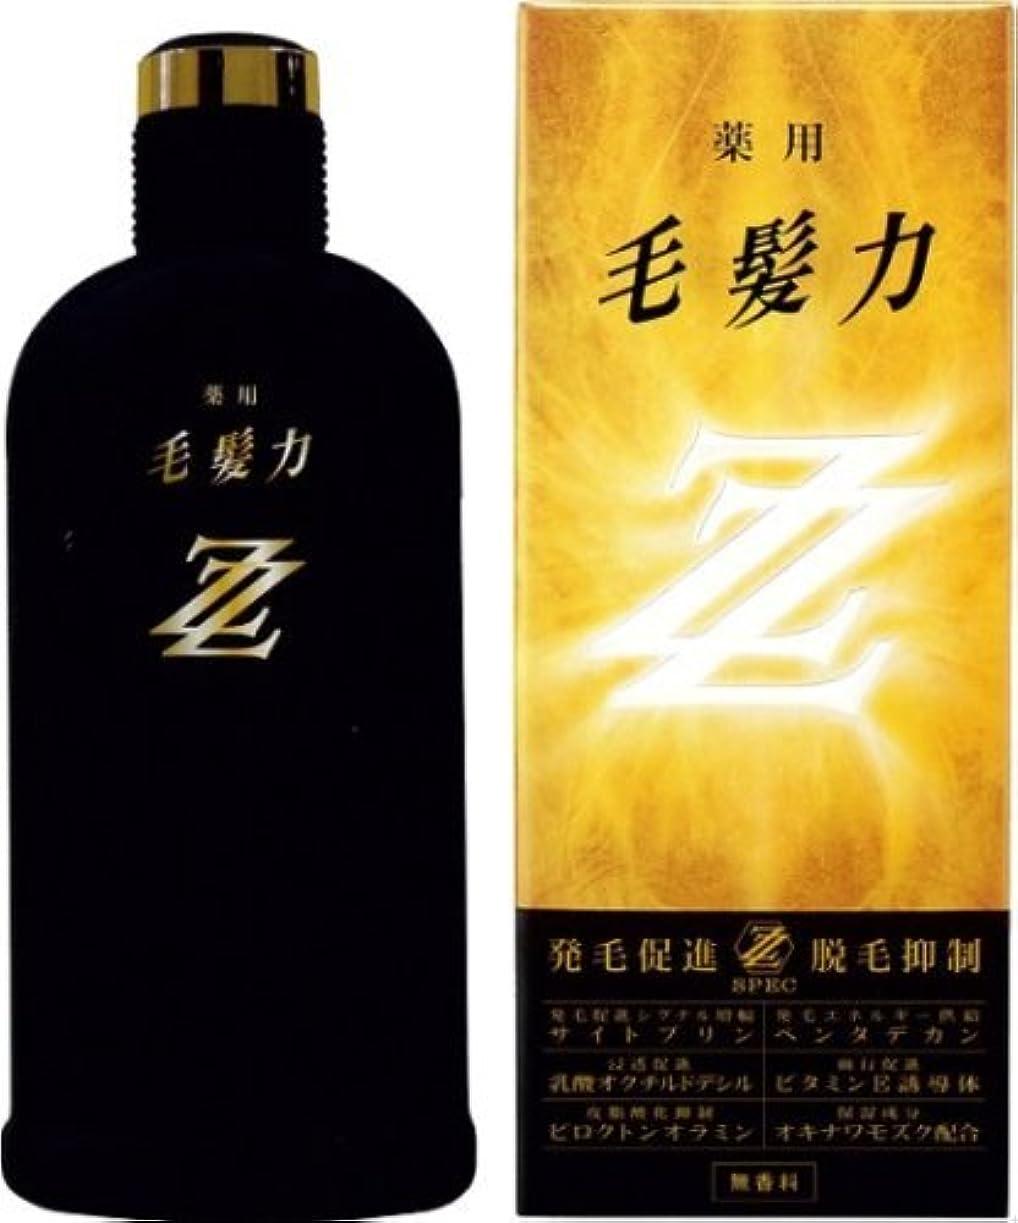 薬用毛髪力ZZ 200ml ×10個セット